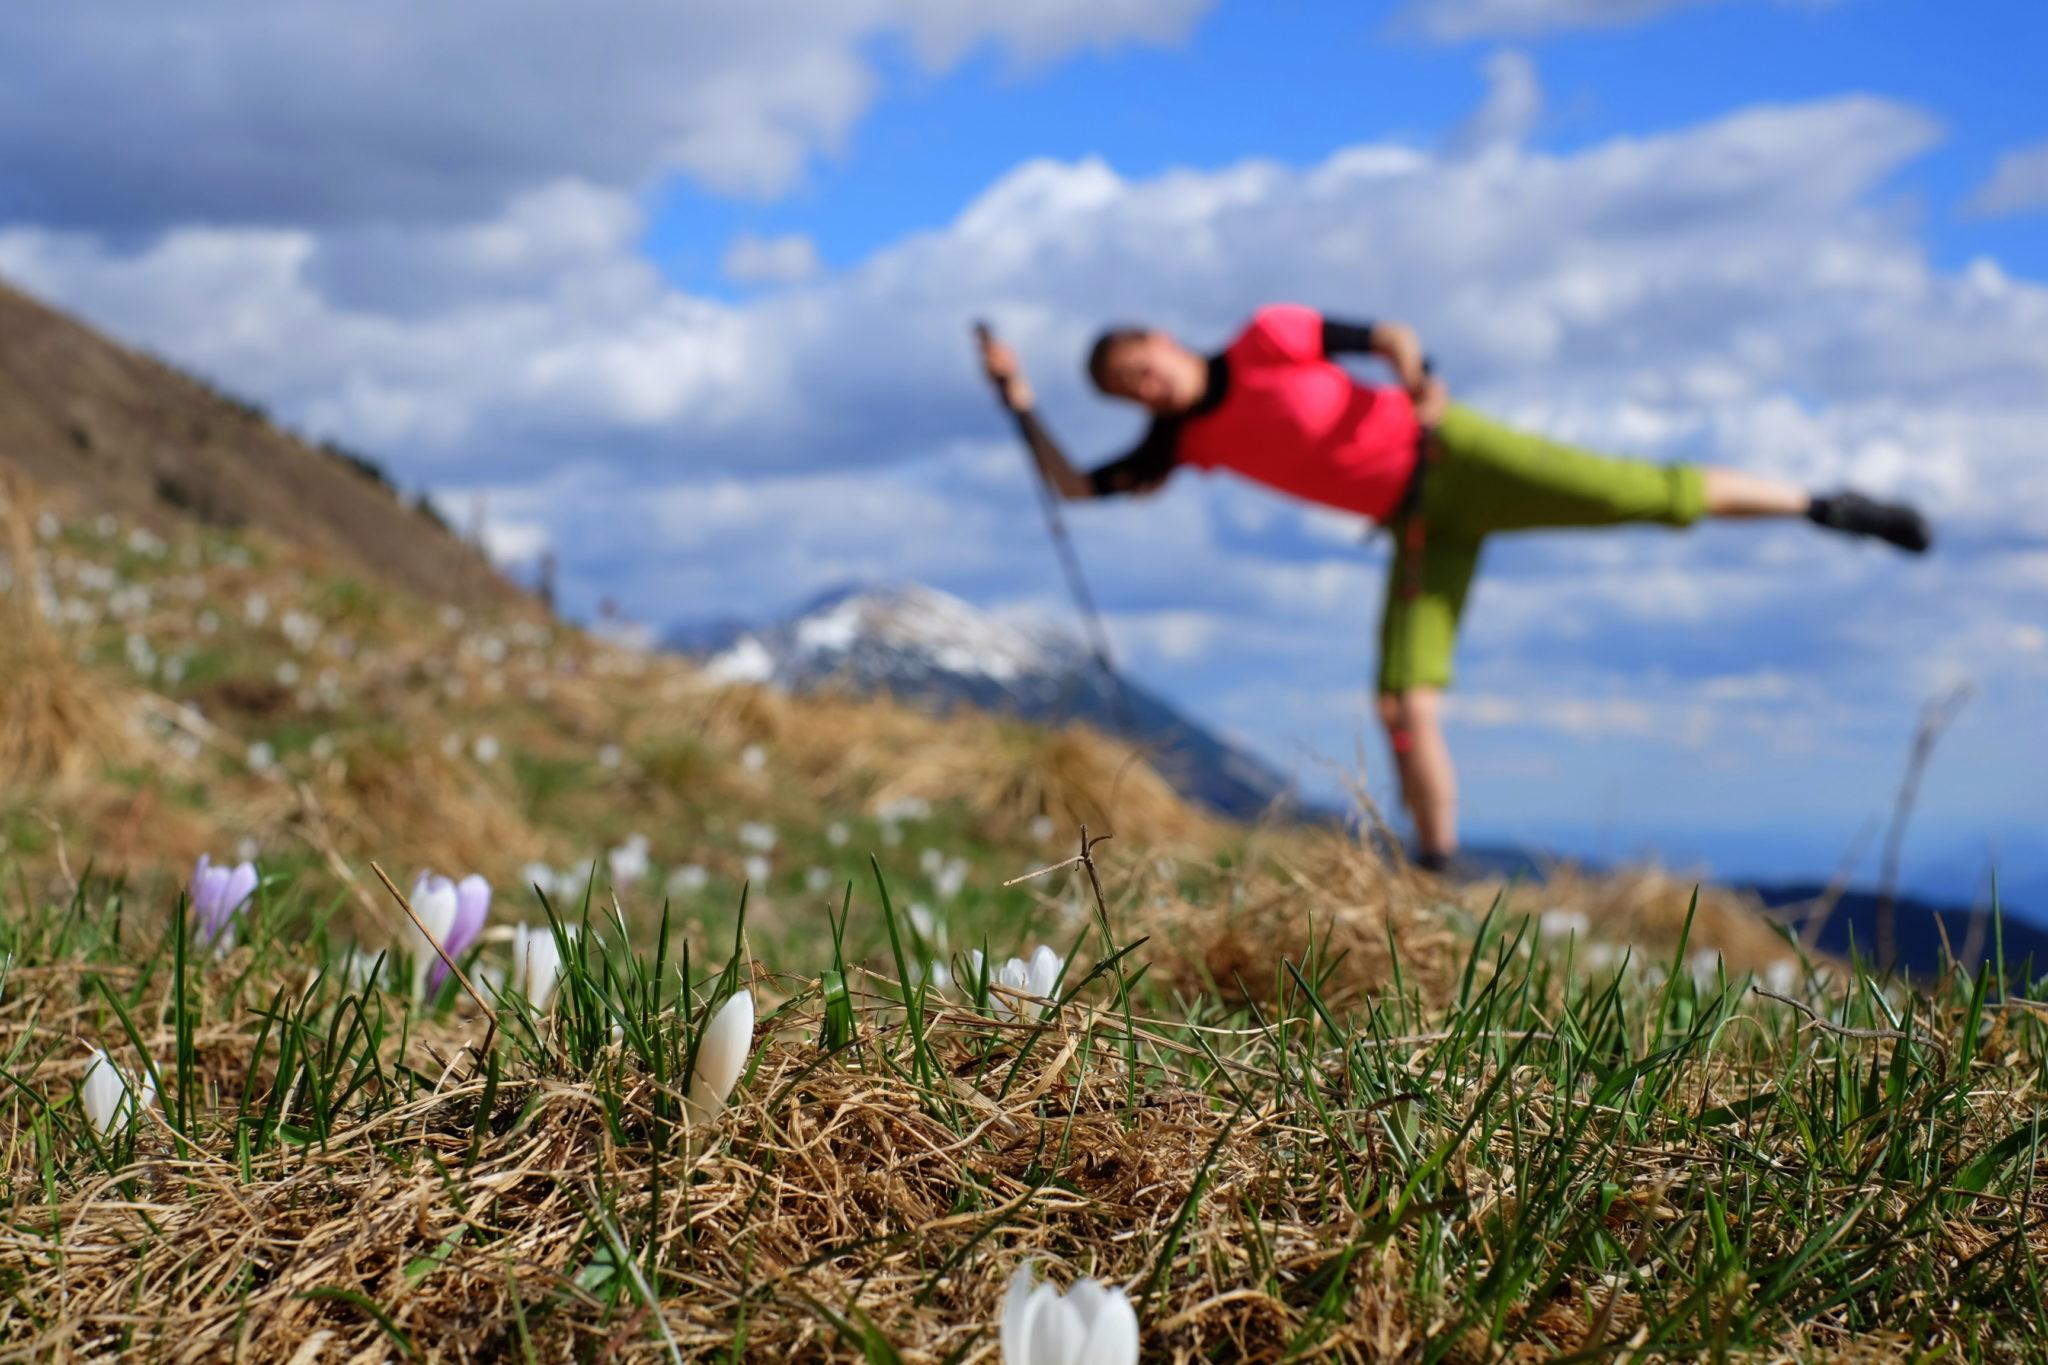 Mountains, flowers, crocuses, woman mountaineer, sun